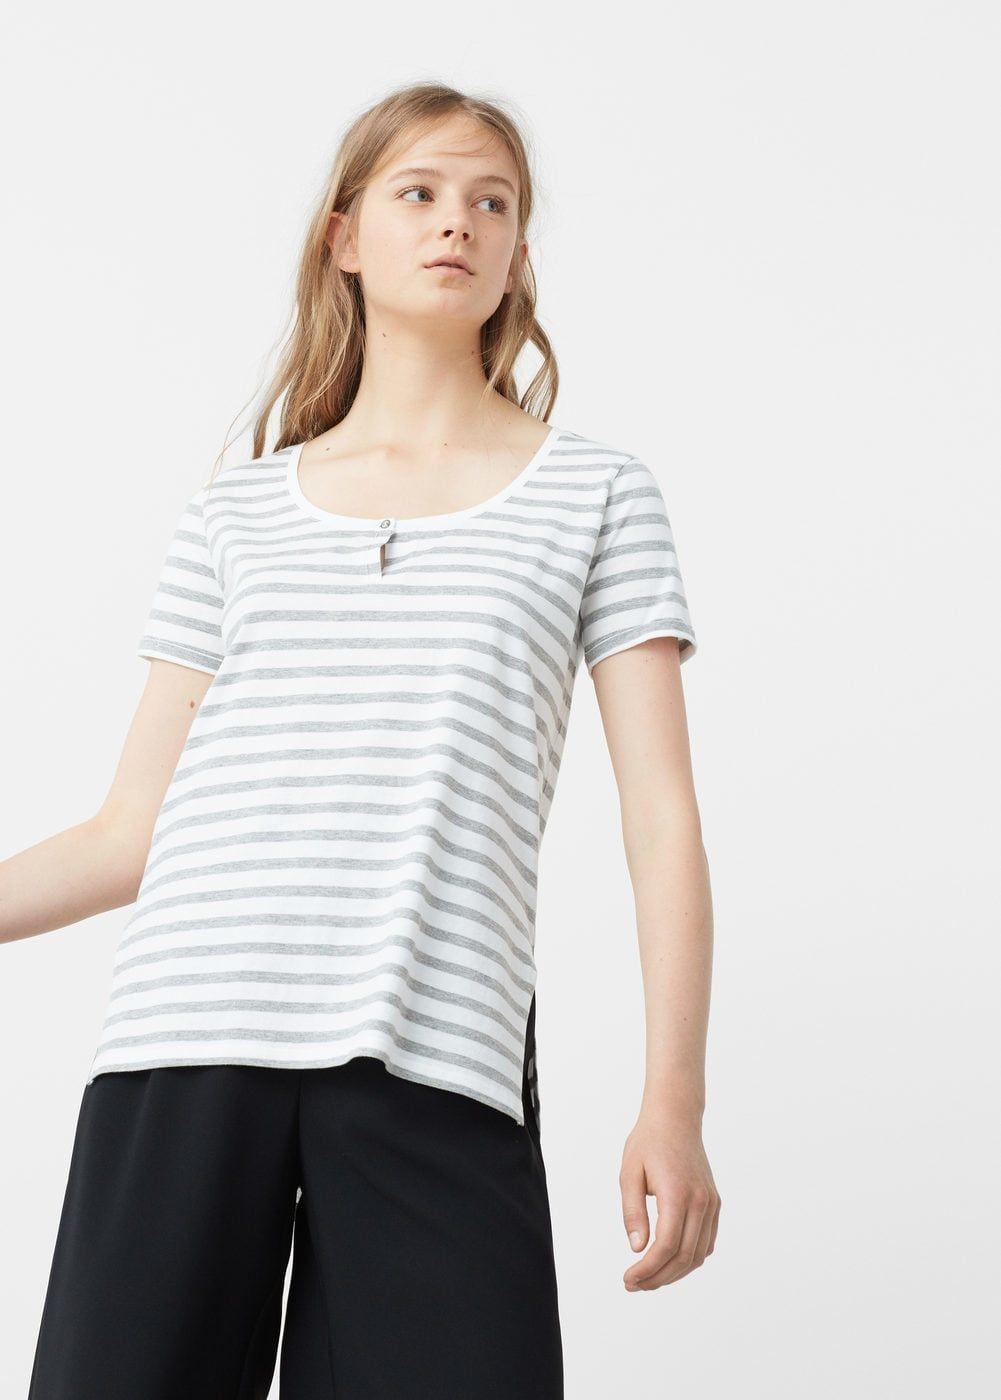 Fashion style Sleeve Trendsshort sweatshirt trend for girls